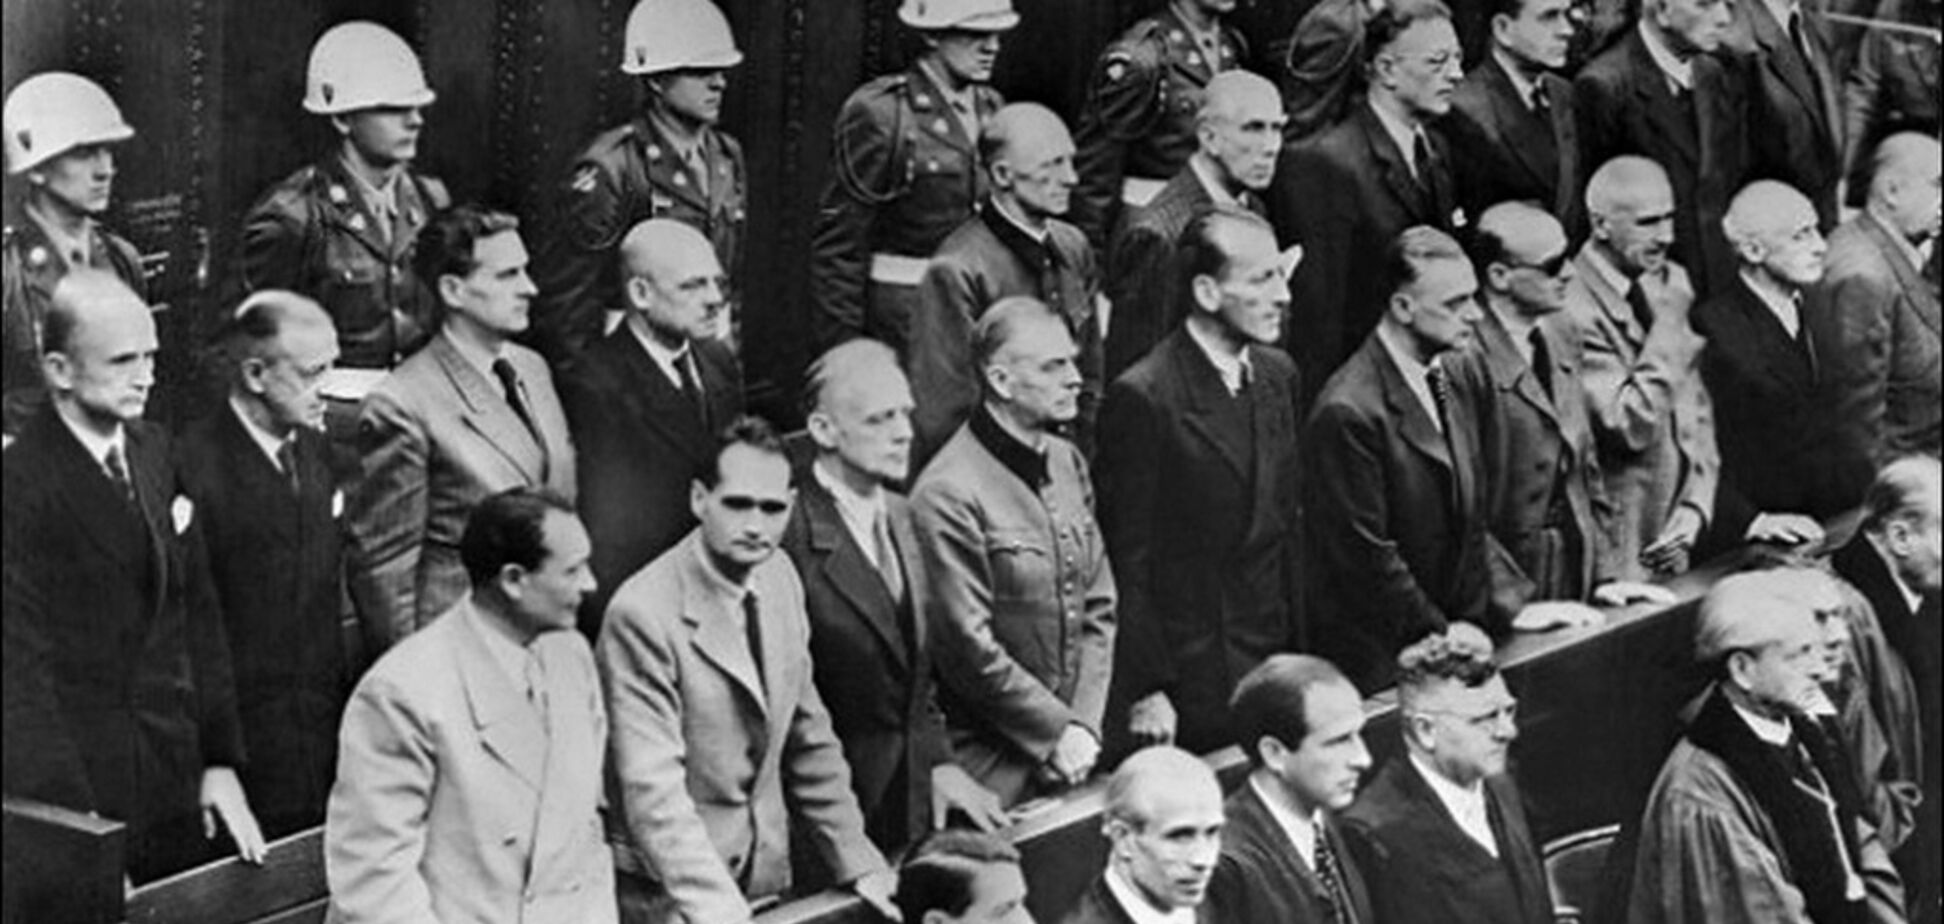 Кто судил нацистских преступников?